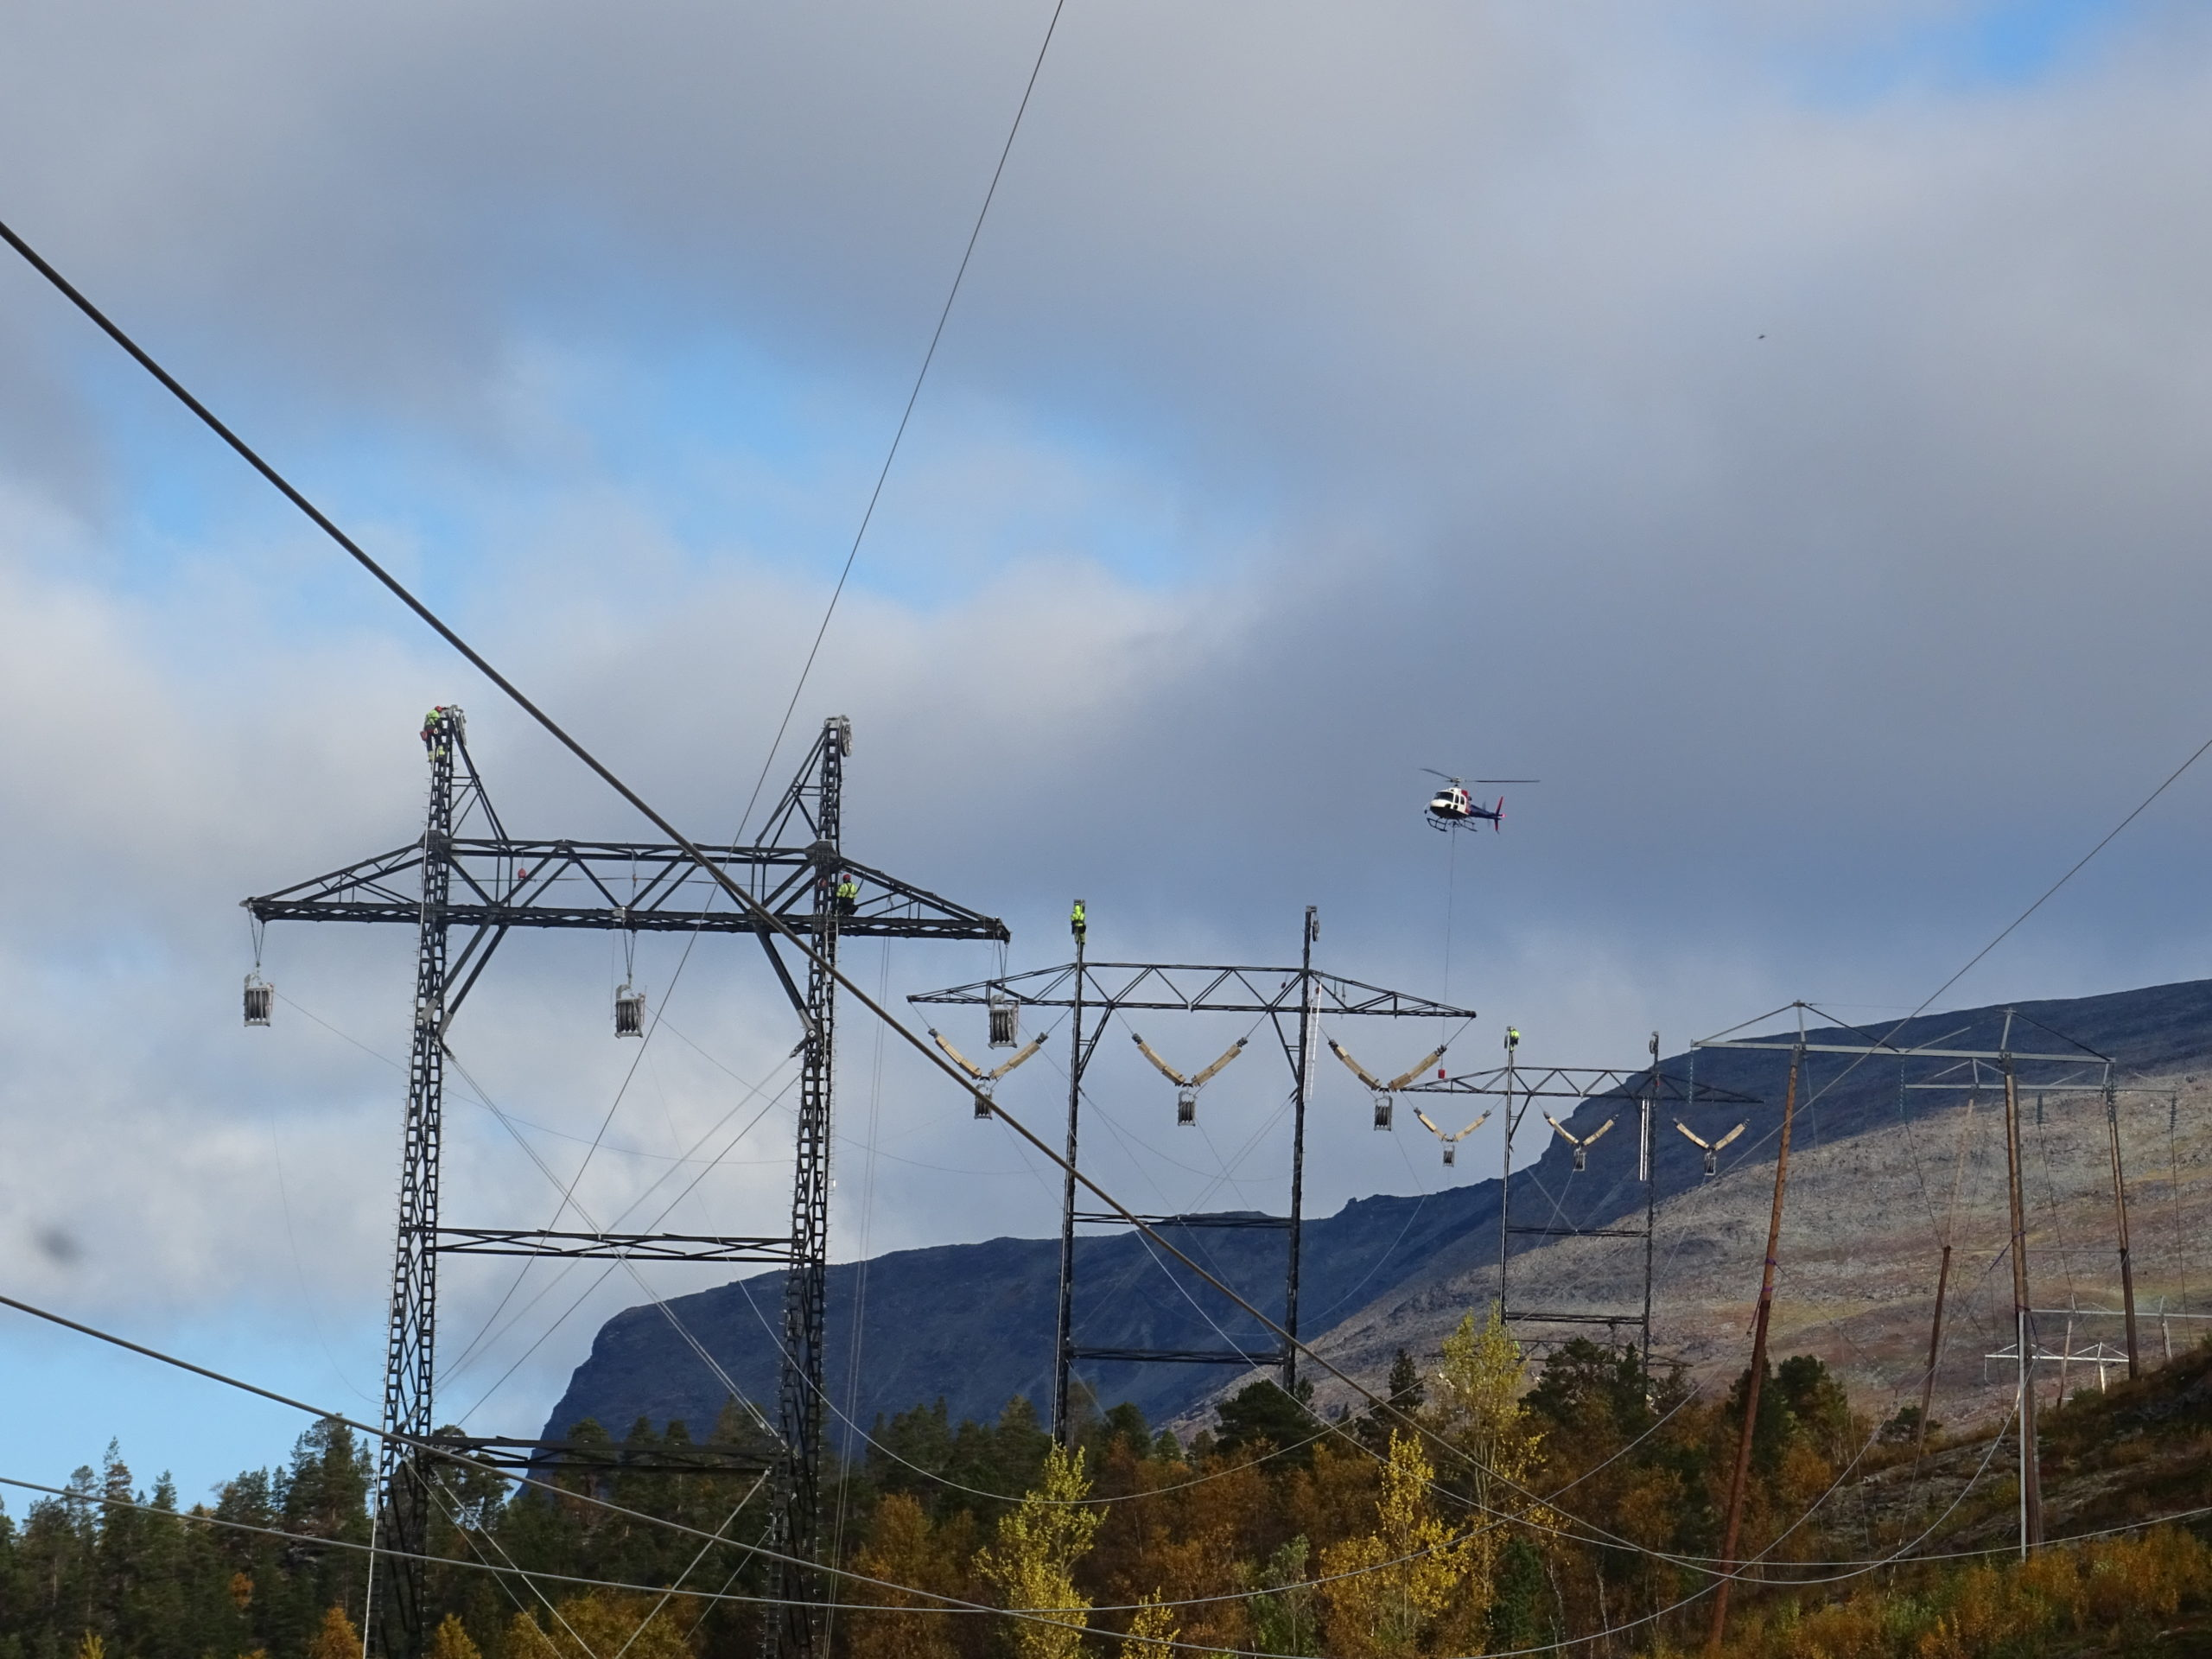 balsfjord-skillemoen